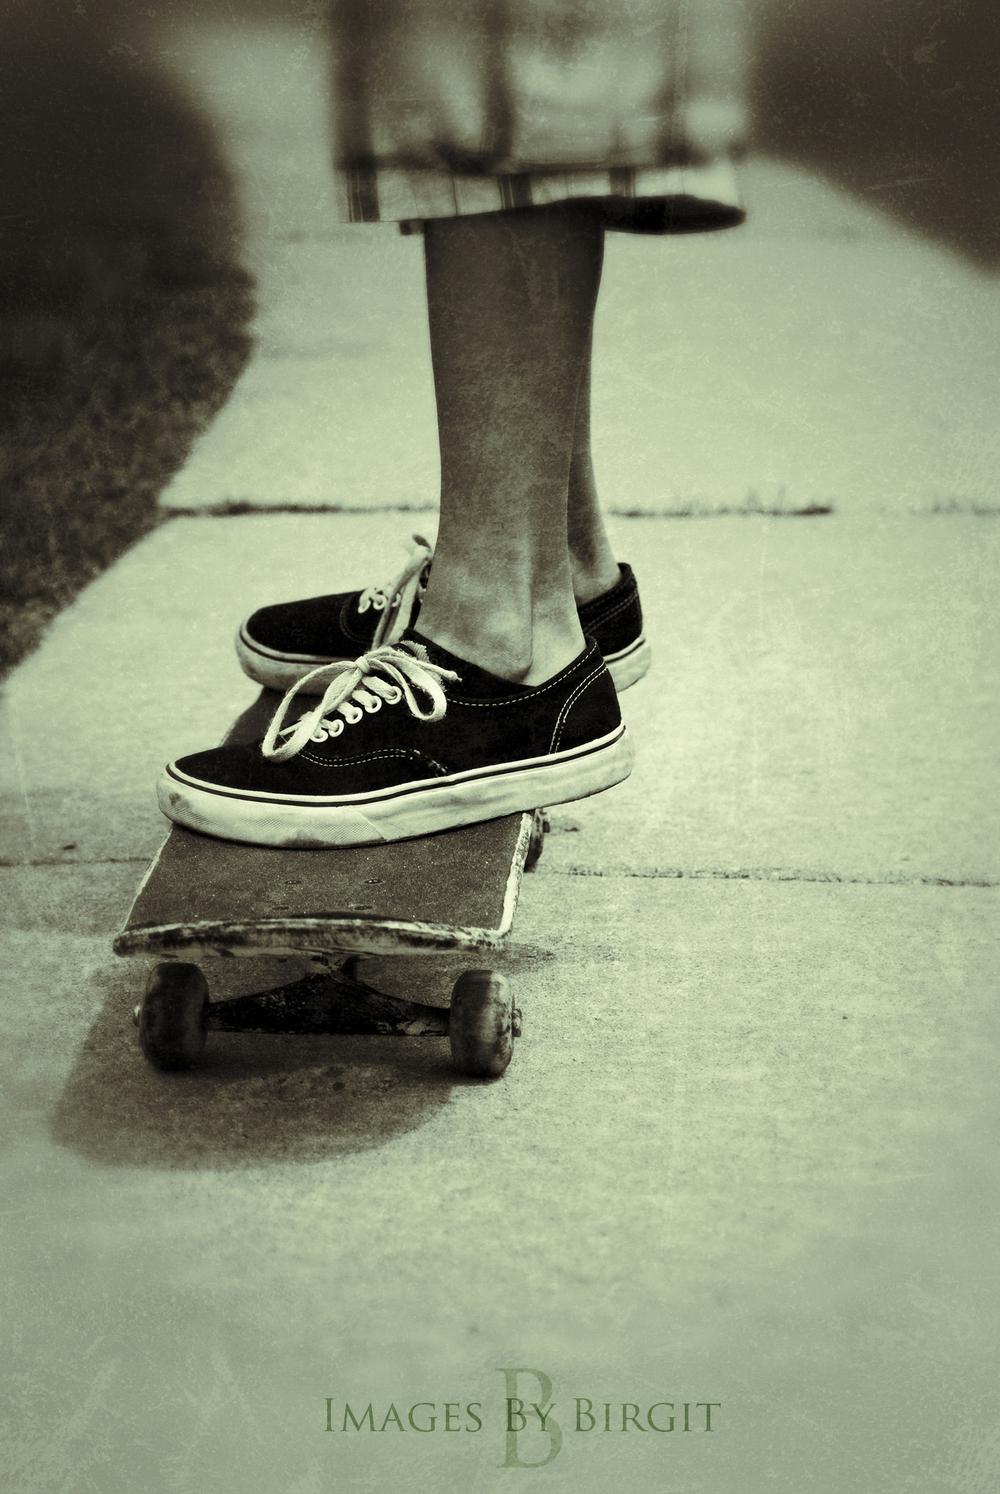 Skateboard 4-1.jpg